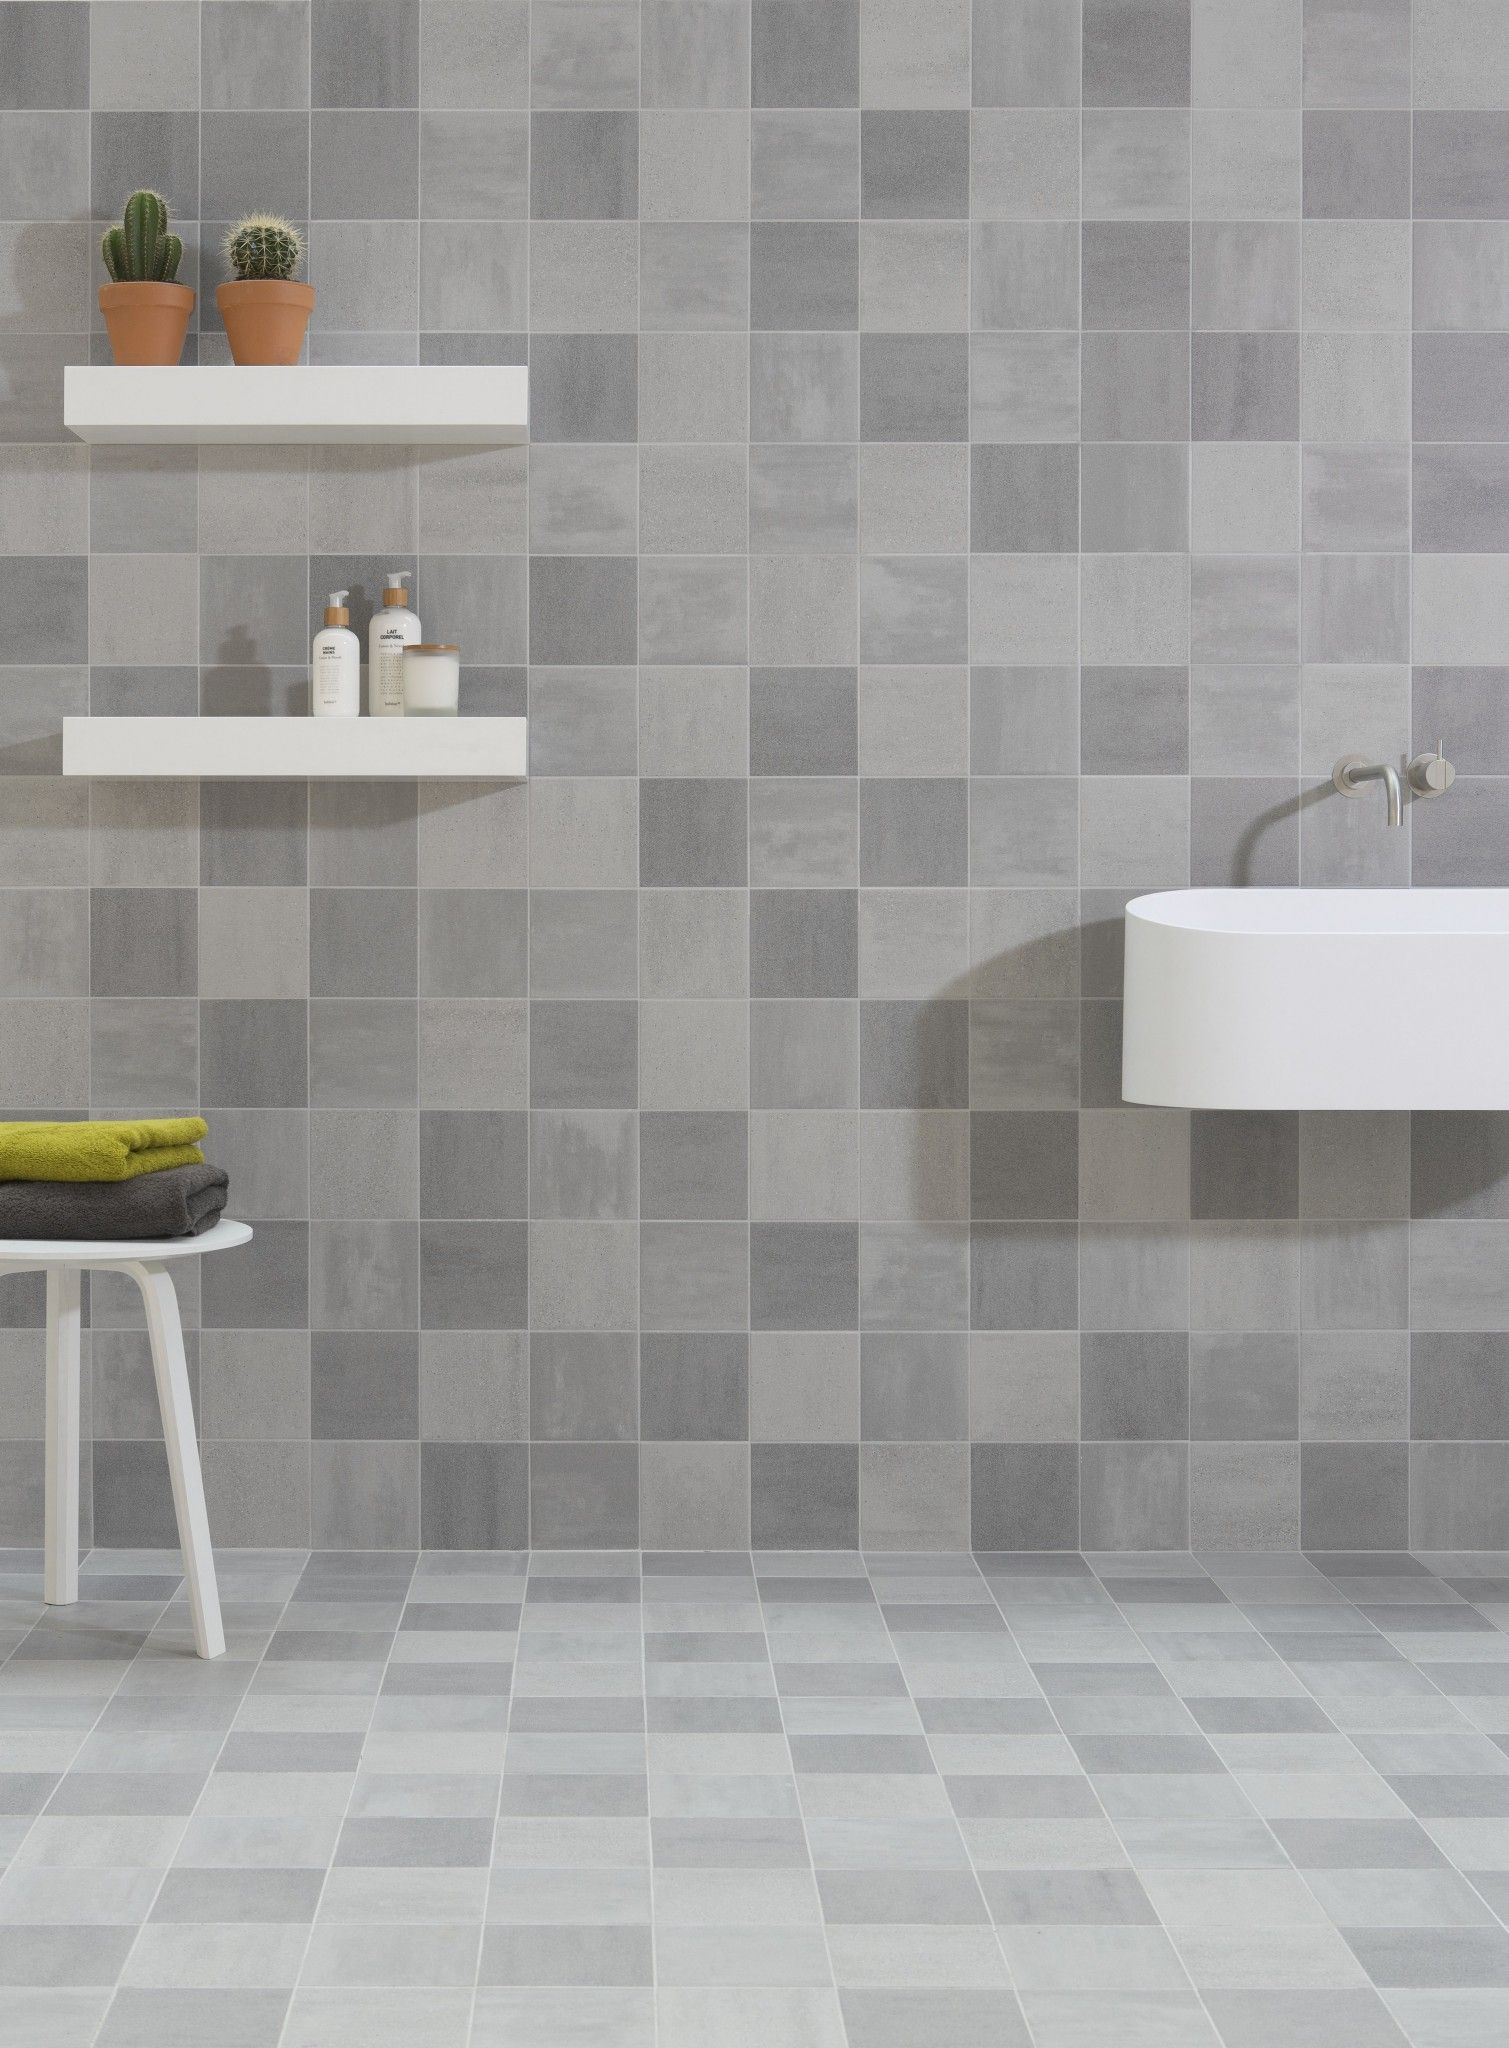 tegels-keramisch-badkamertegels-grijs-licht-klein-Gilbo | badkamer ...